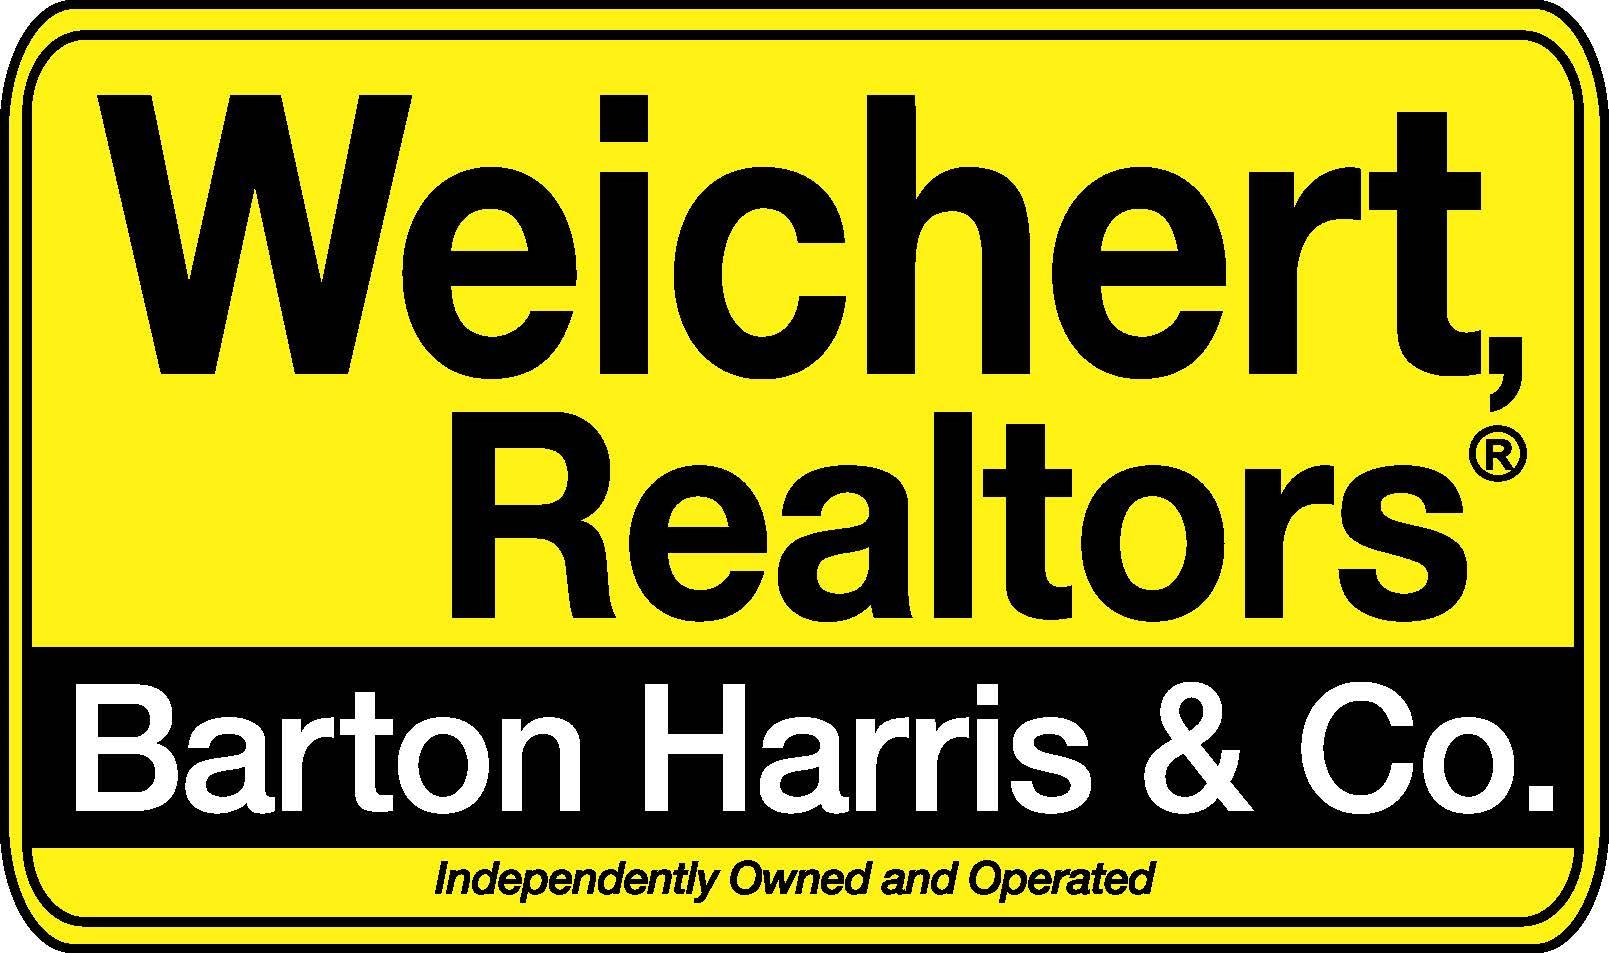 WEICHERT REALTORS® - Barton Harris & Co.